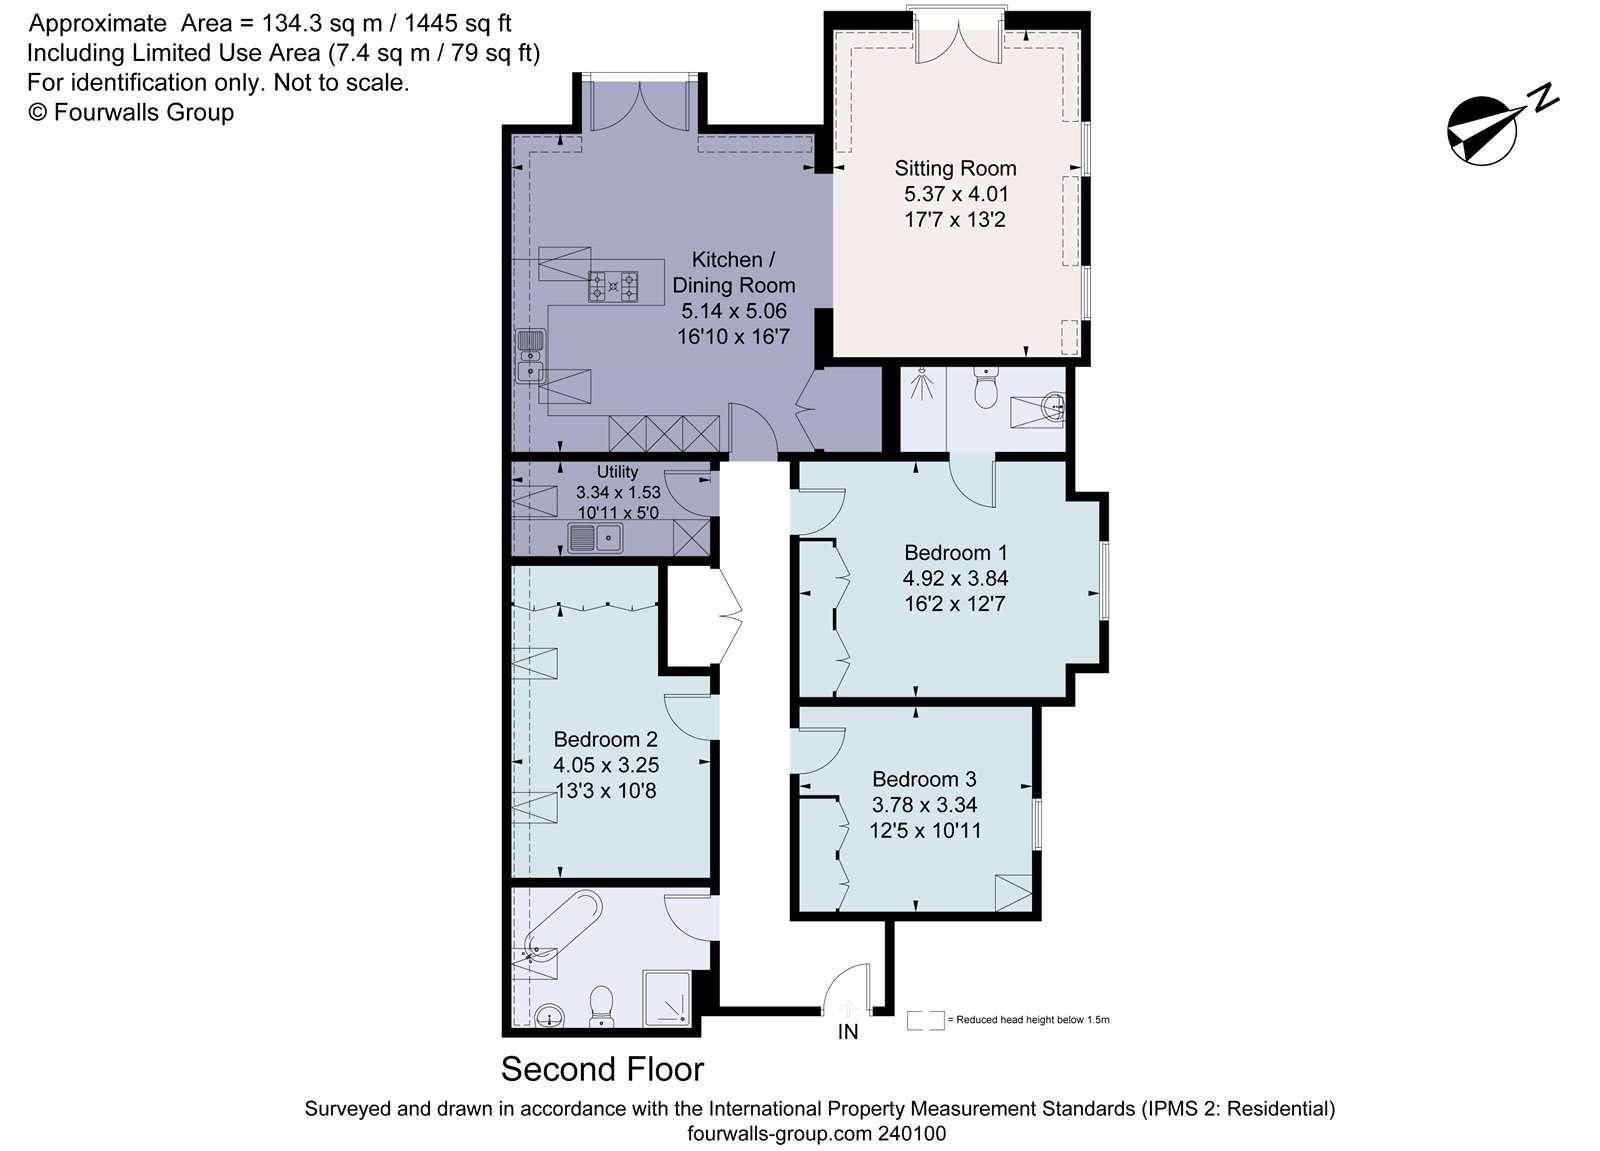 Savills | St. Bernards Road, Solihull, West Midlands, B92 7FJ | Properties  for sale